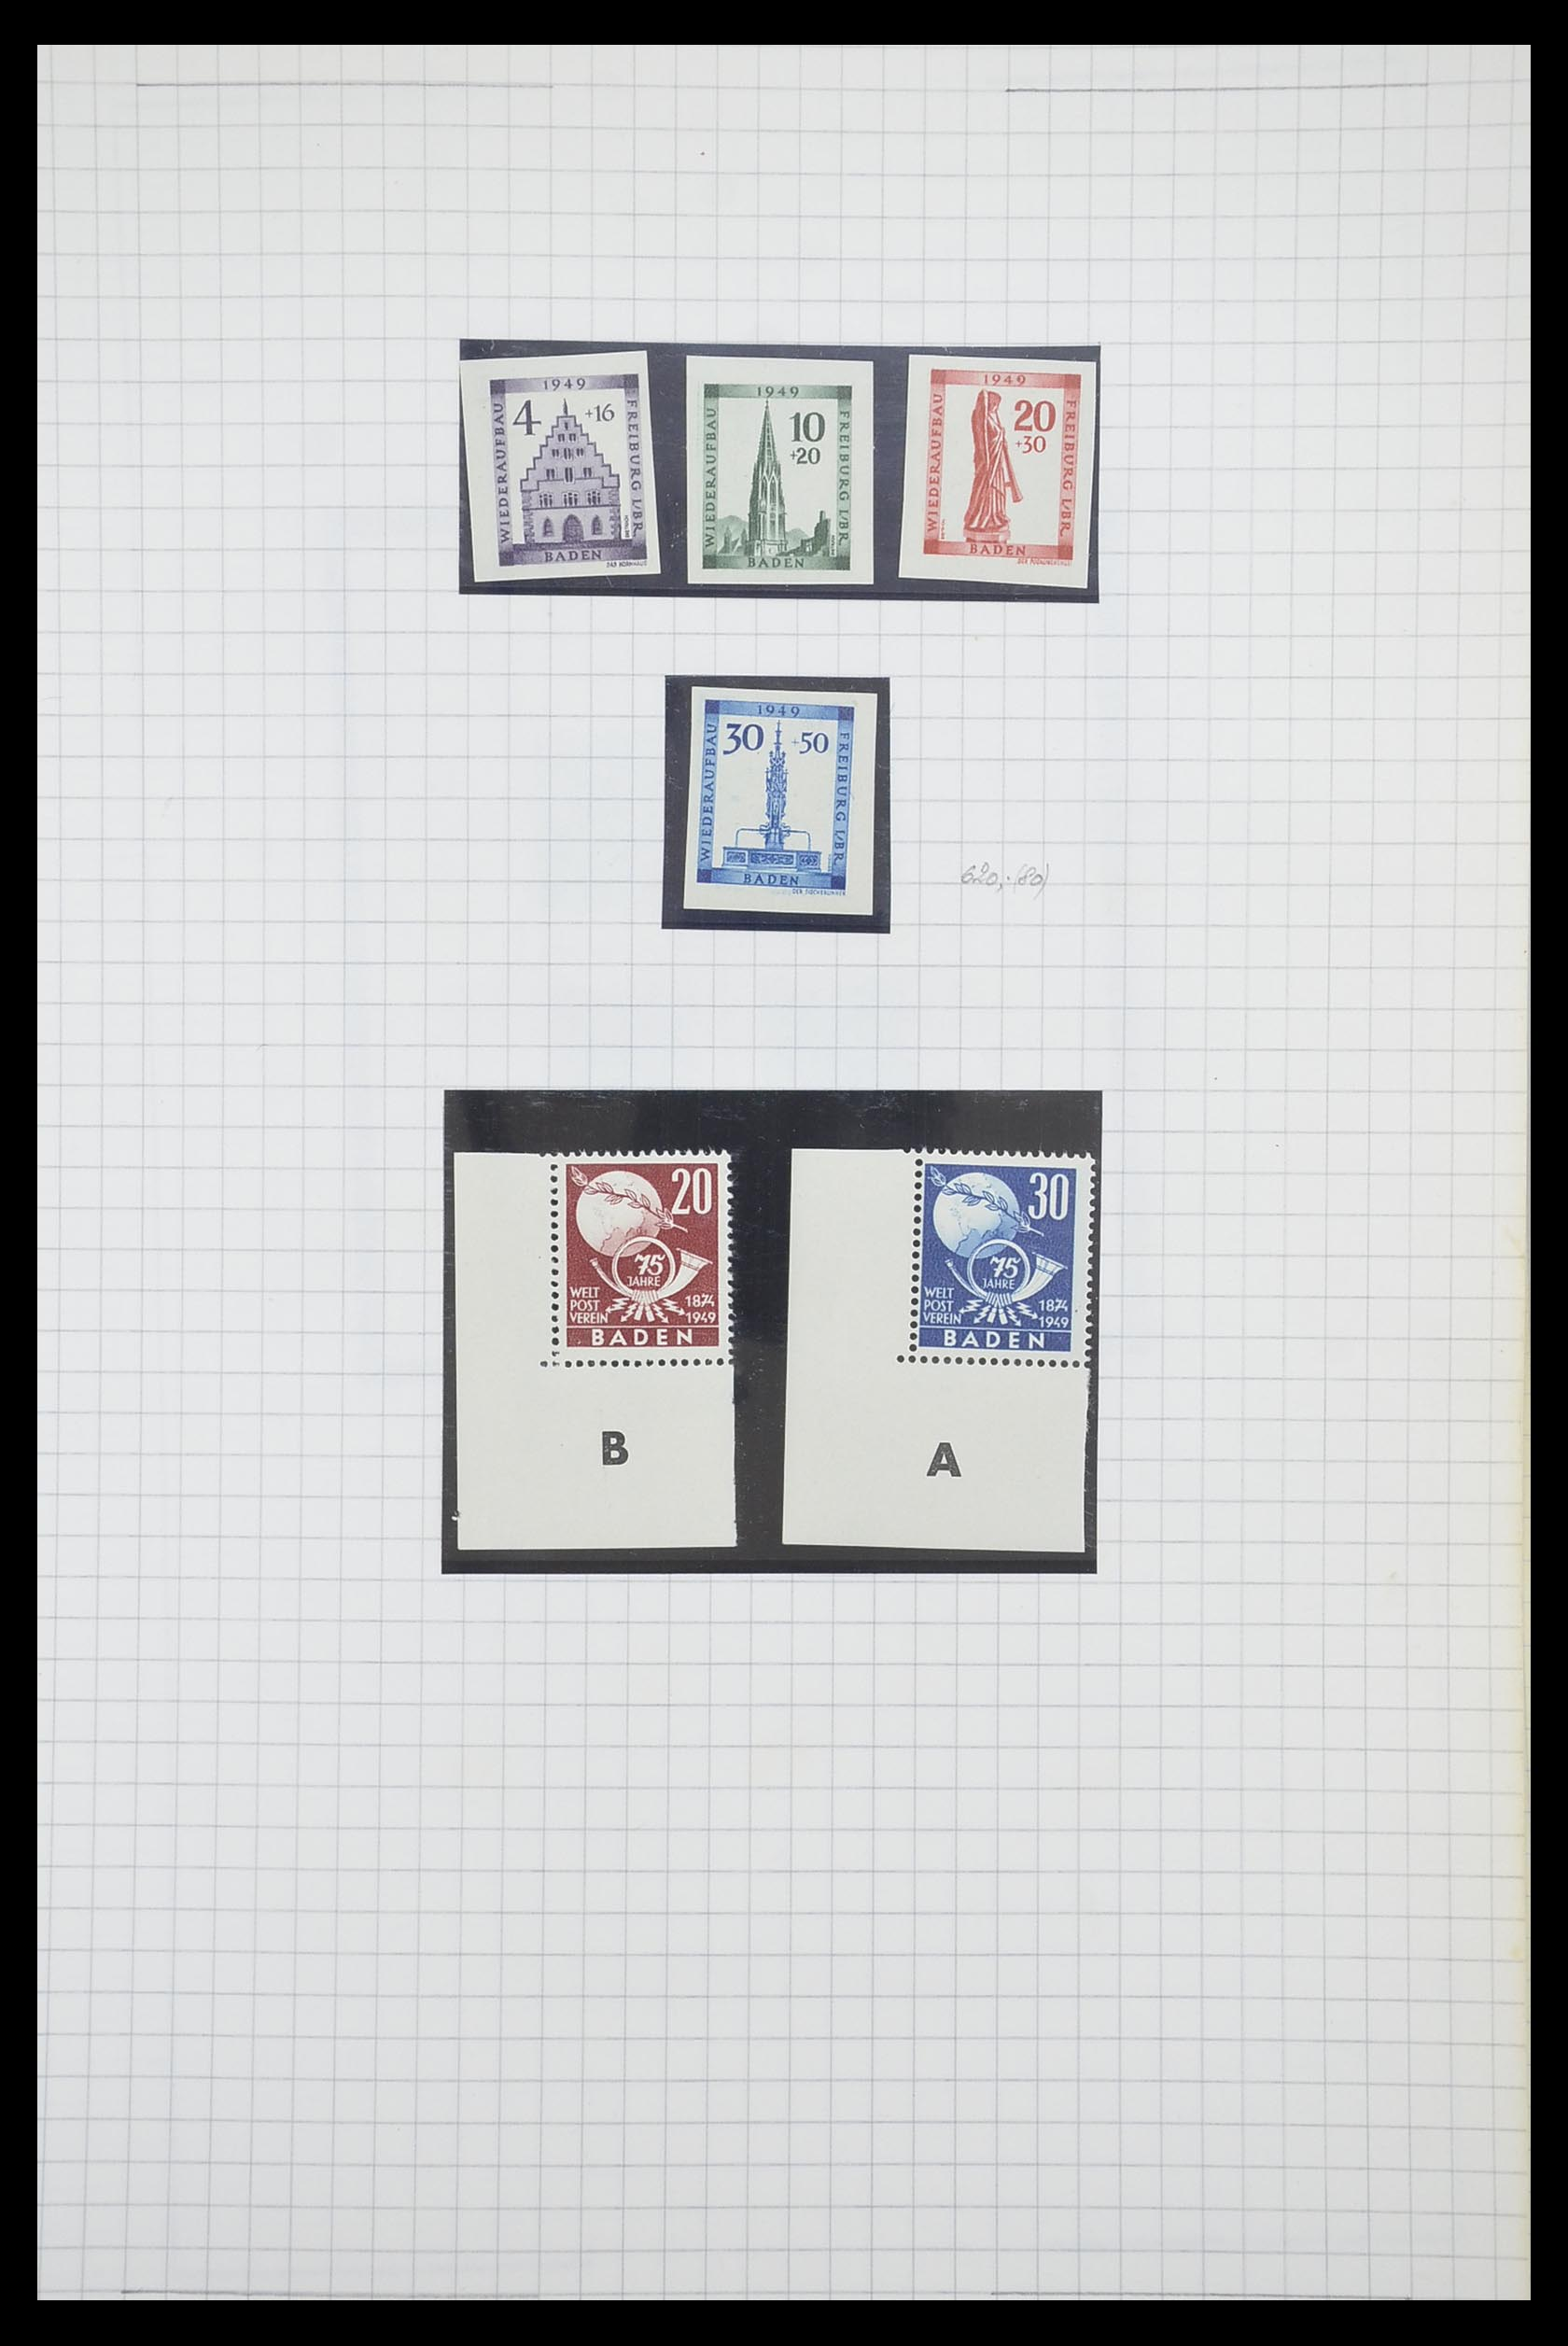 33864 011 - Postzegelverzameling 33864 Franse Zone 1945-1949.